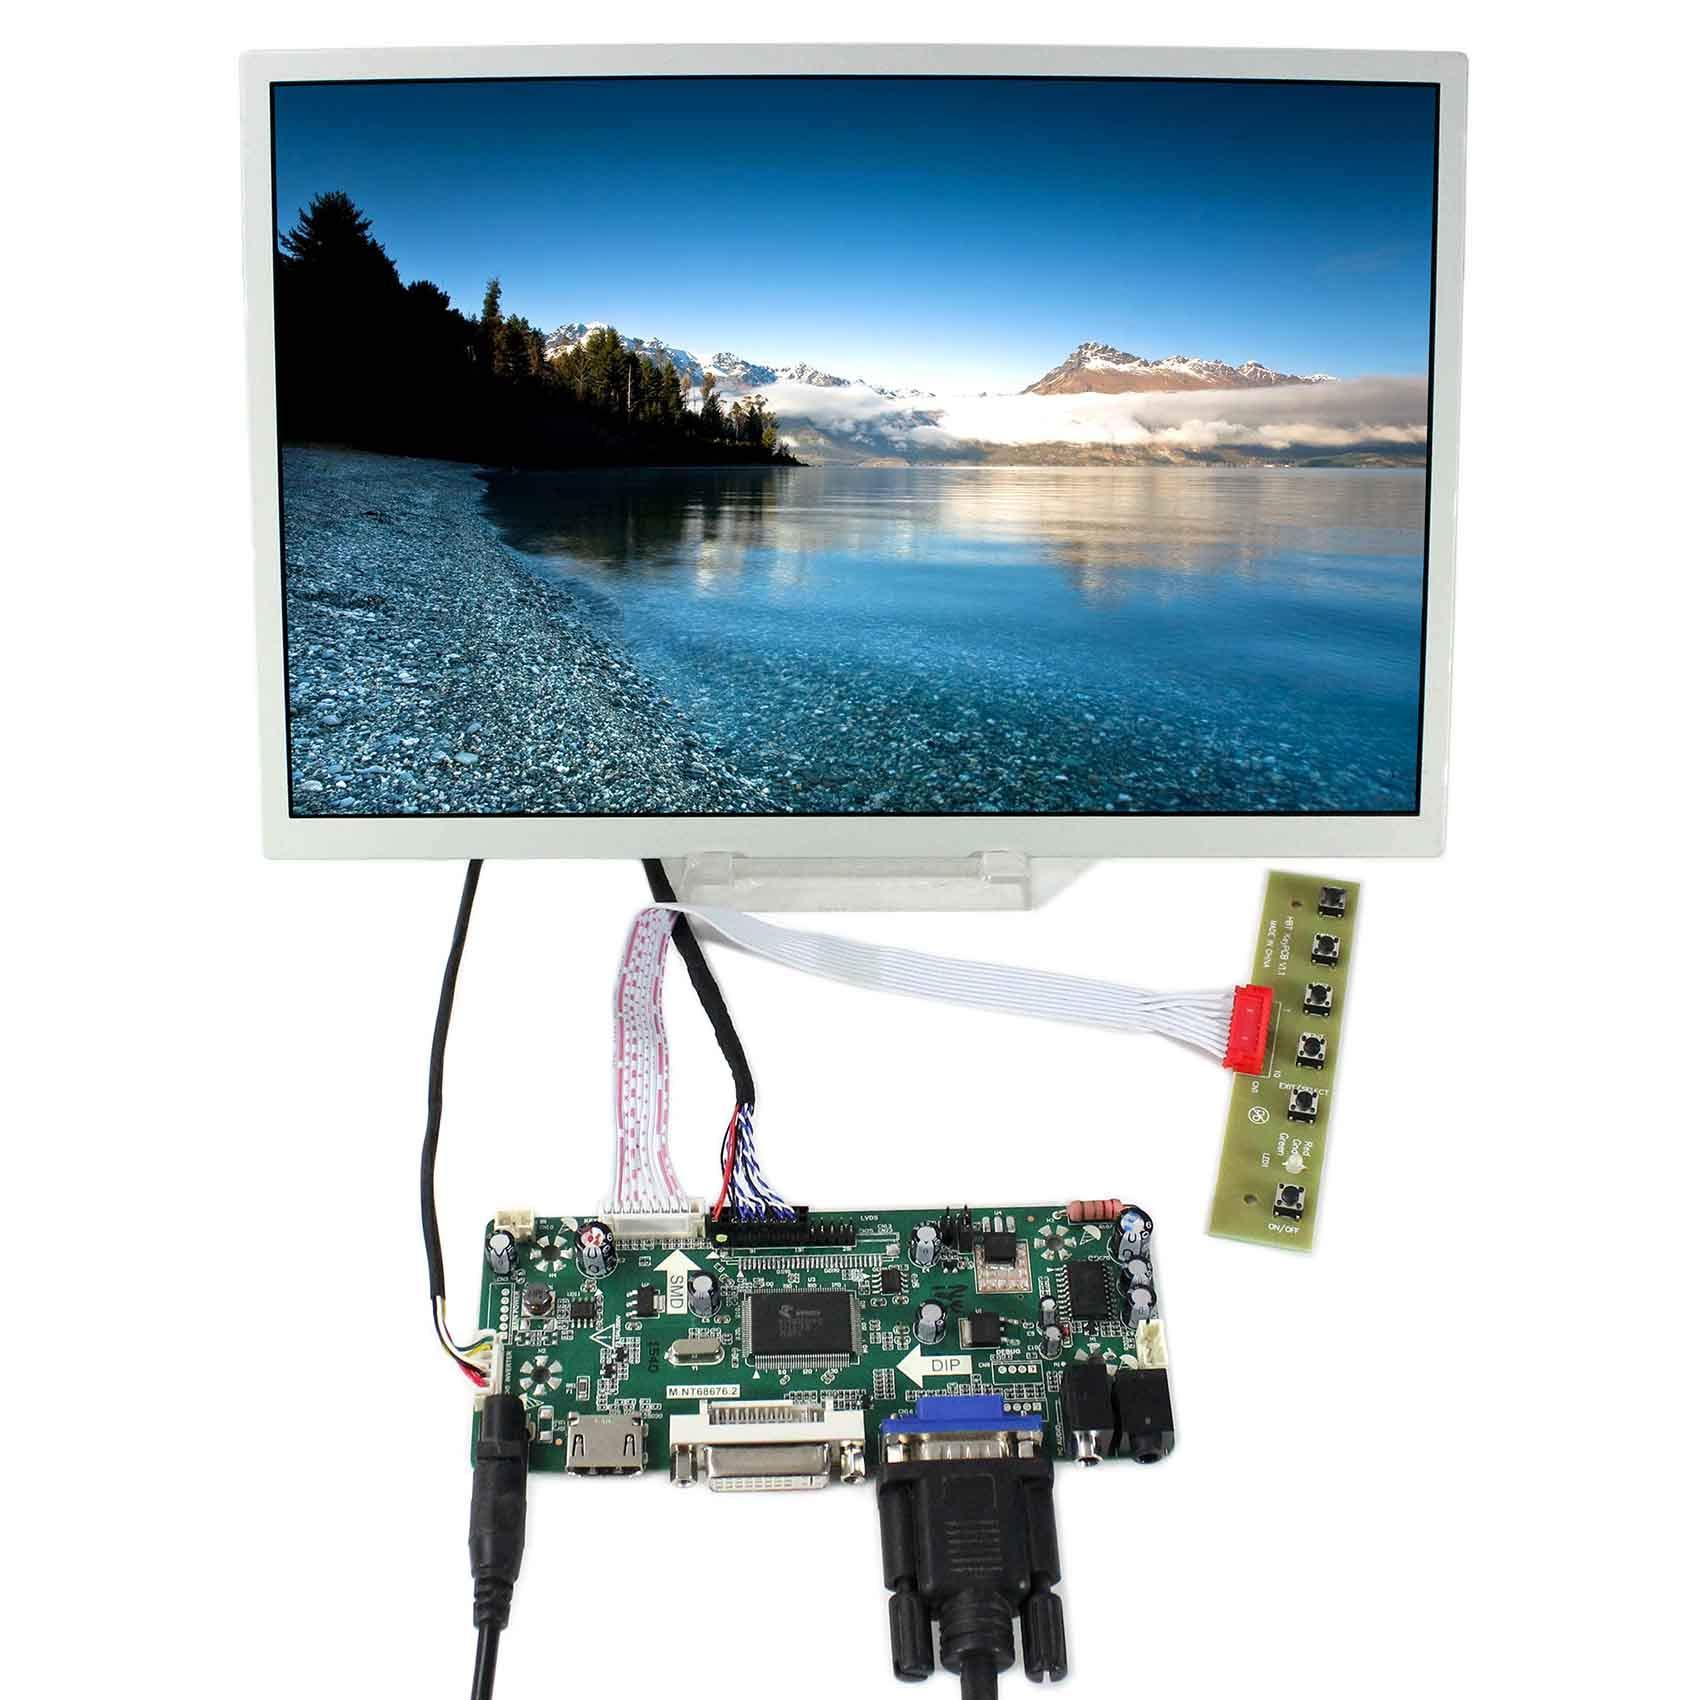 Controladora LCD HDMI VGA 12.1 1280x800 LQ121K1LG52